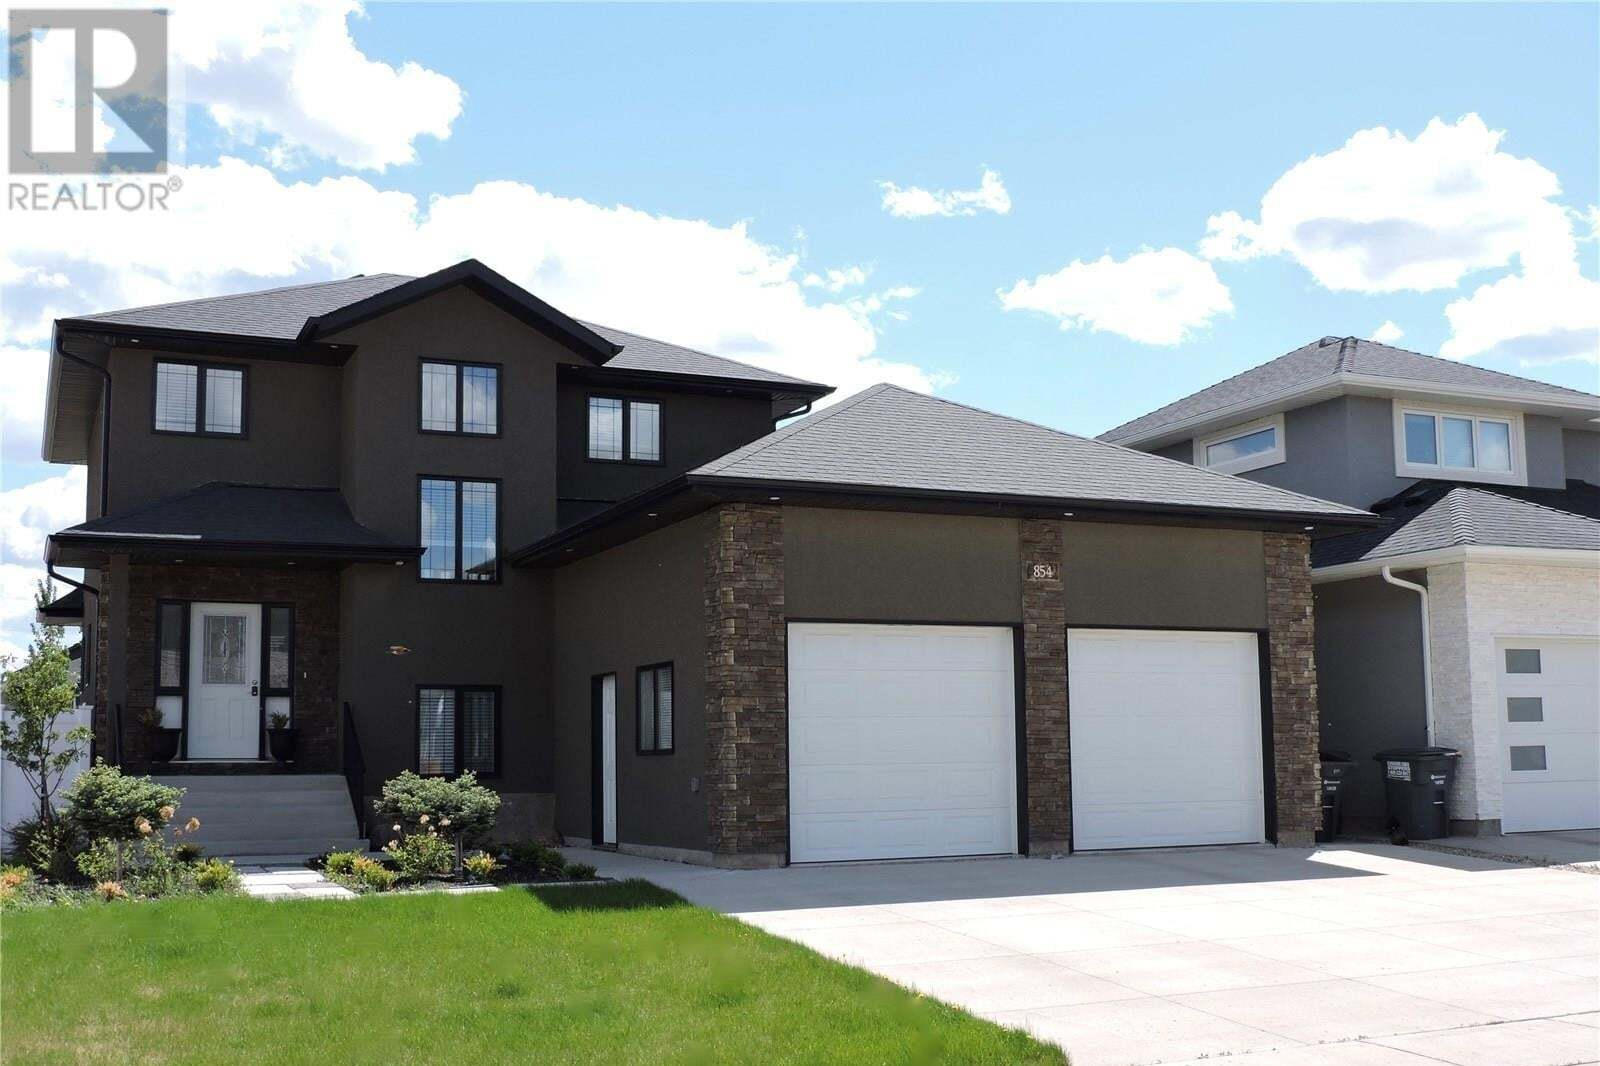 House for sale at 854 Kloppenburg Ct Saskatoon Saskatchewan - MLS: SK811578